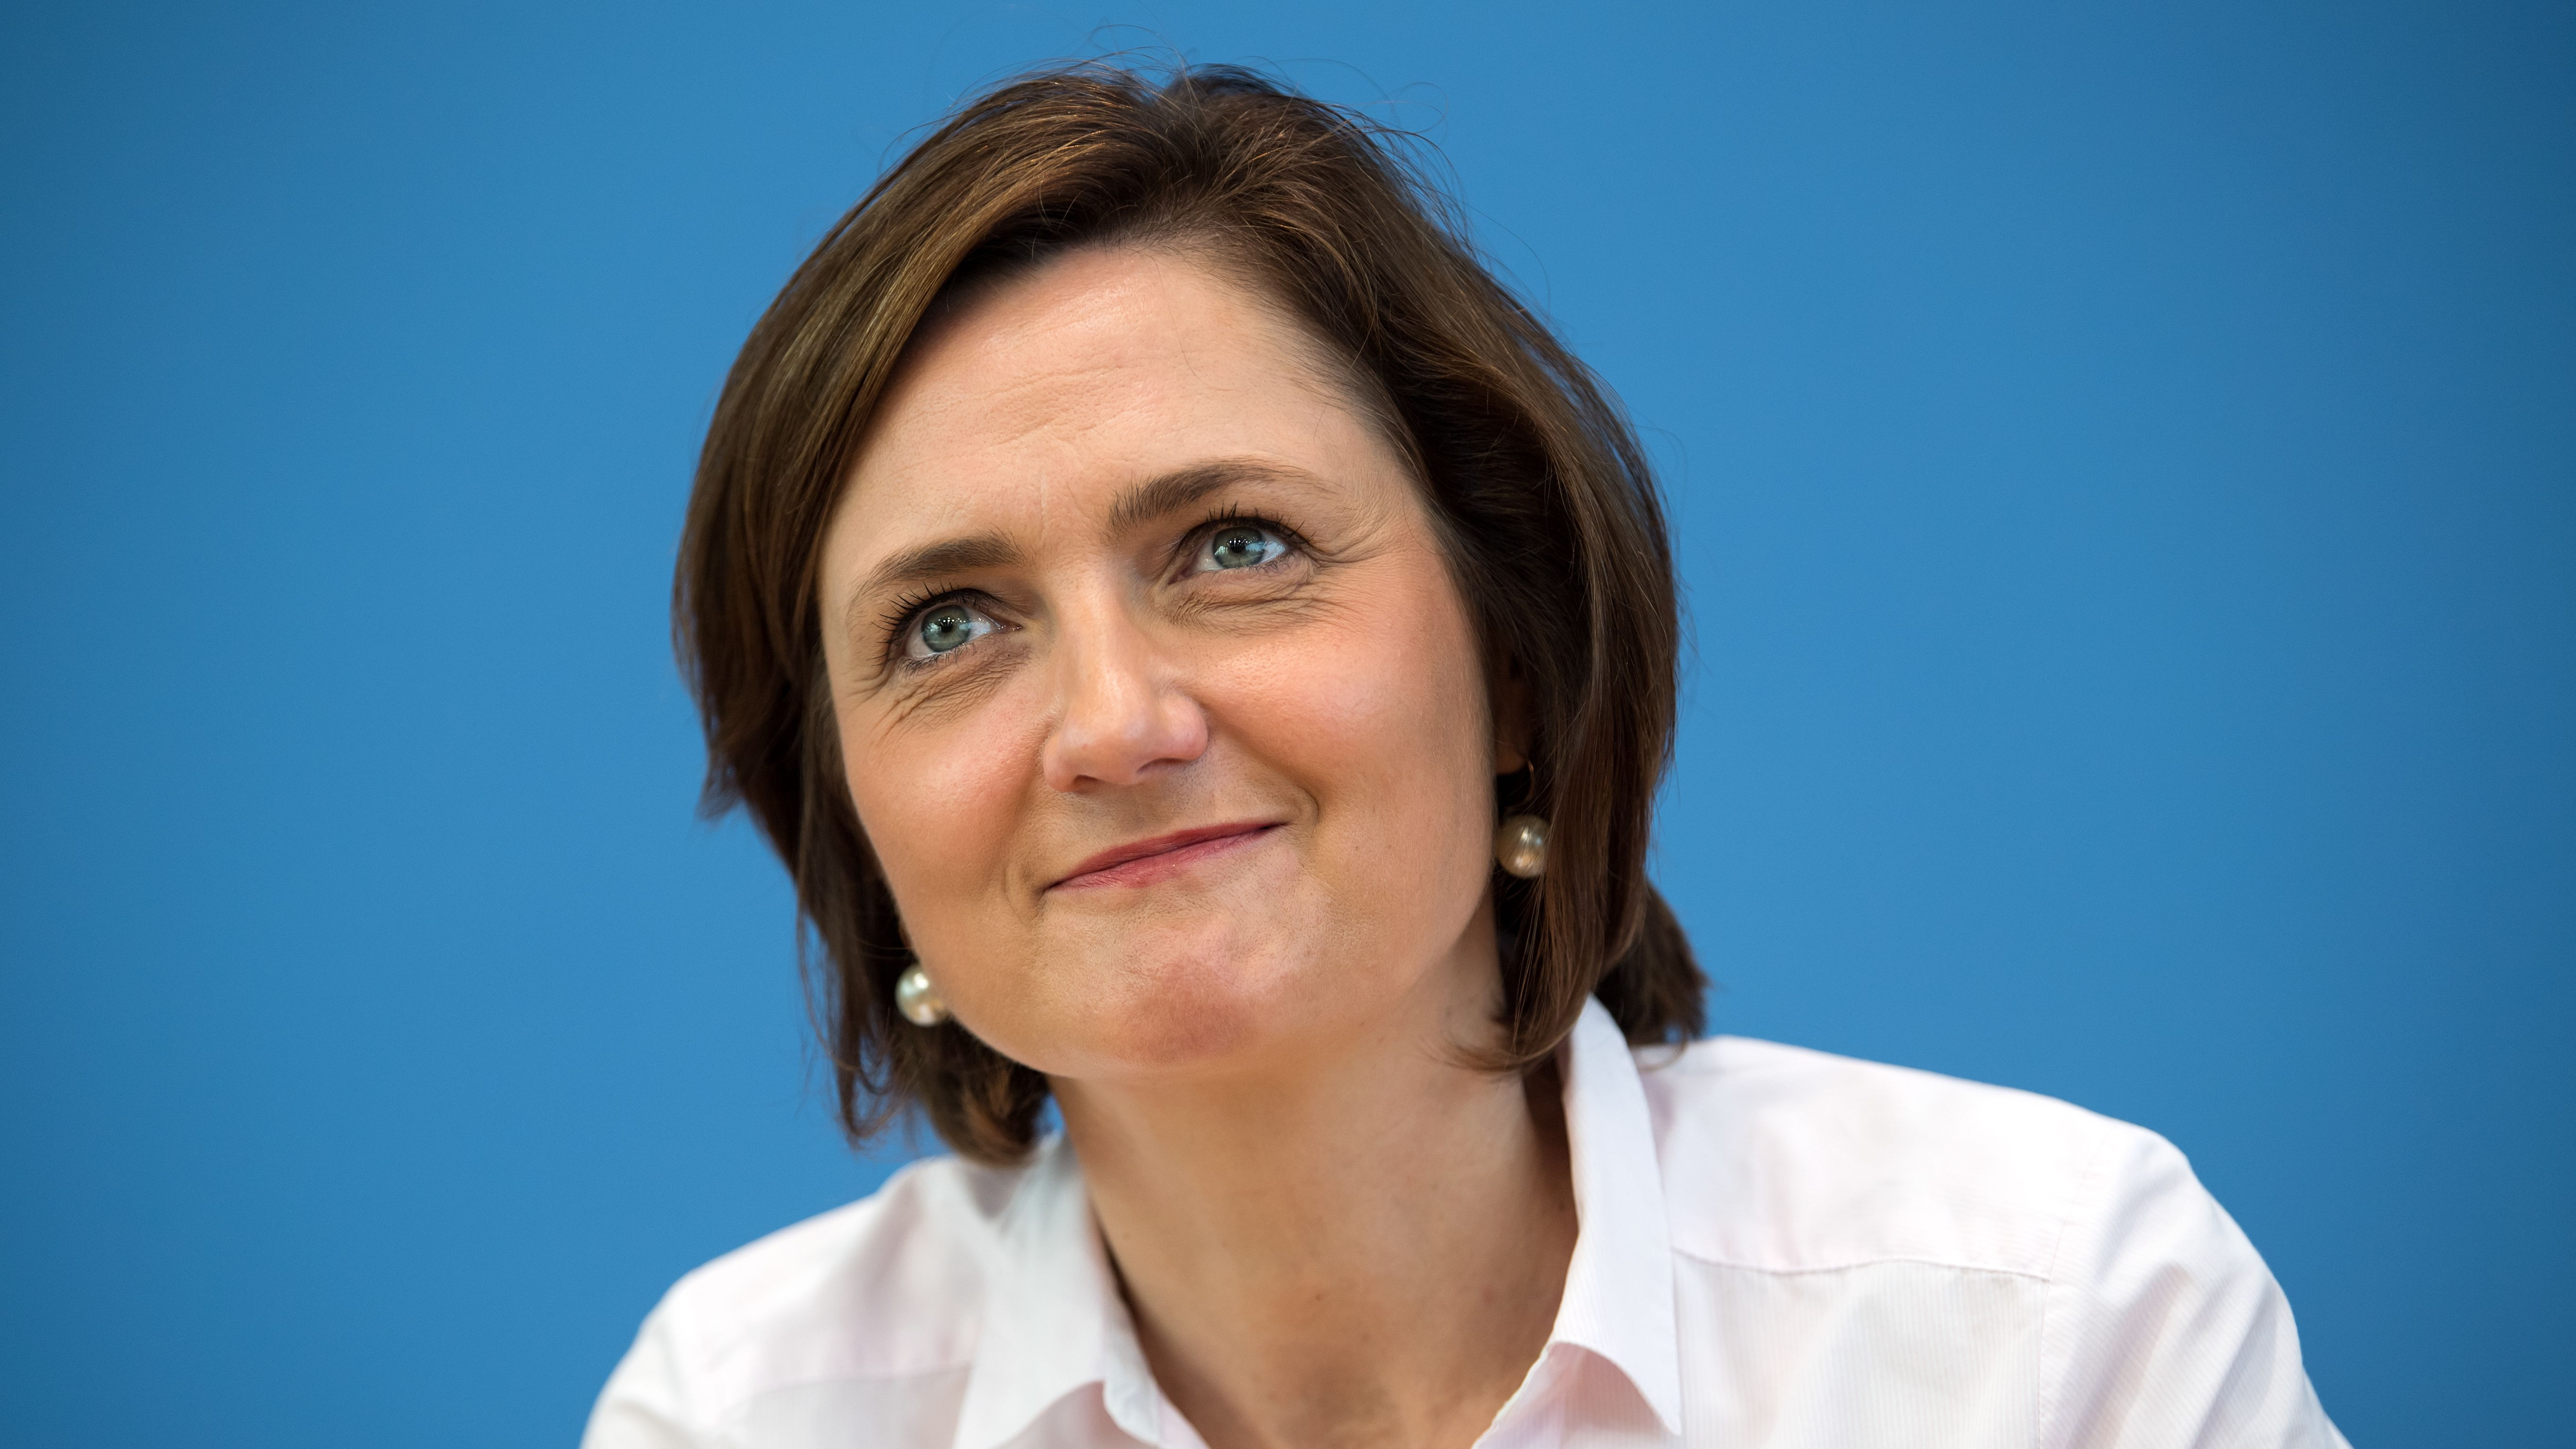 Flensburgs Oberbürgermeisterin Simone Lange (SPD)